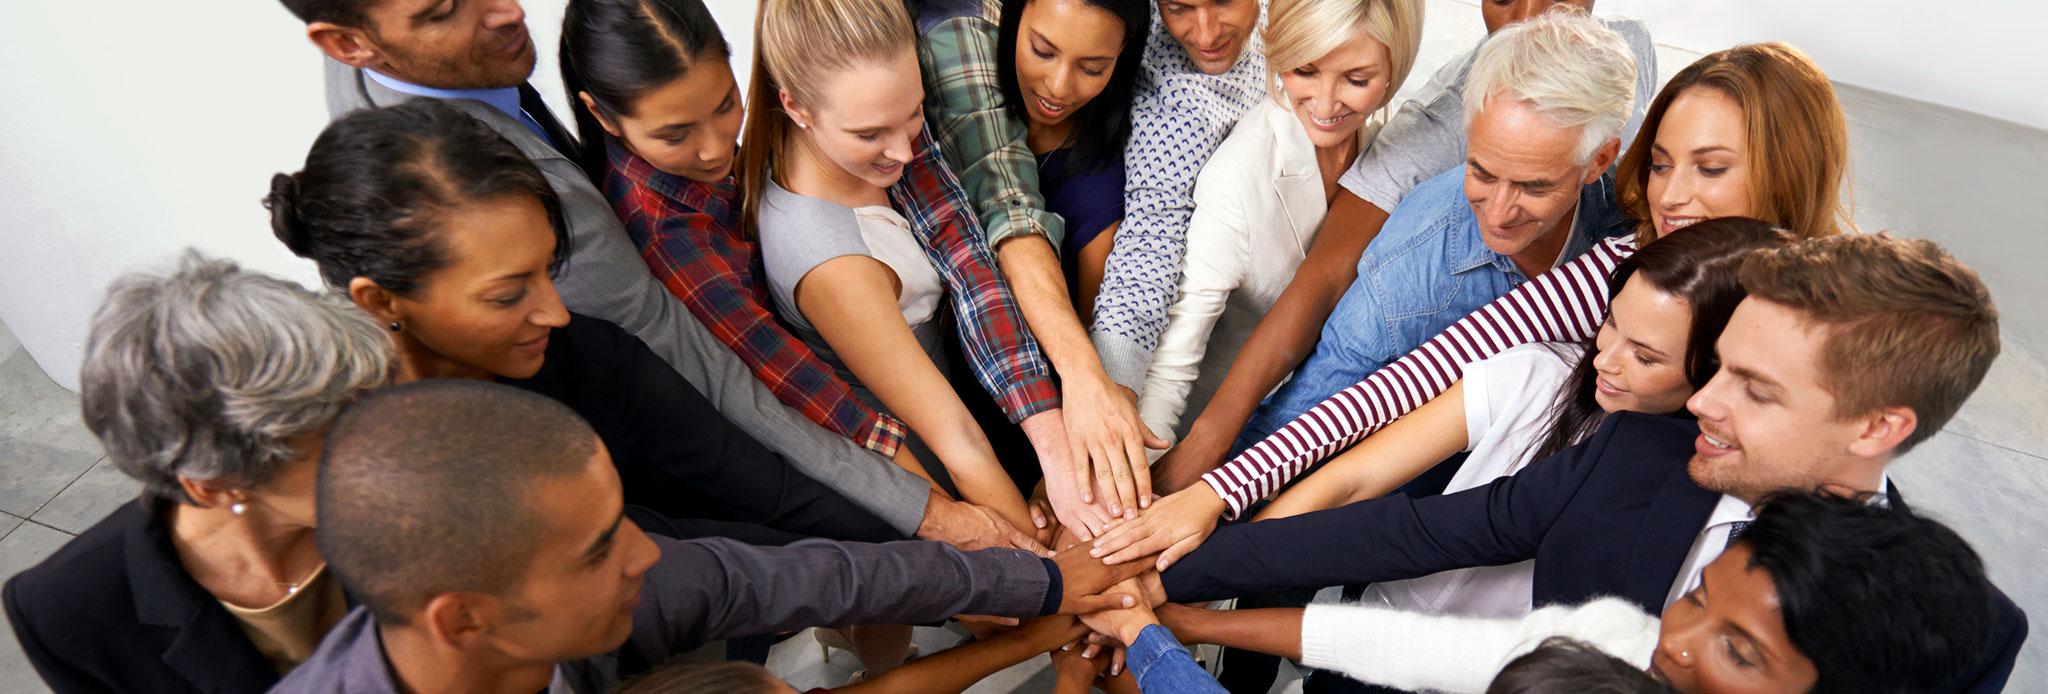 SHRM's Diversity Commitment